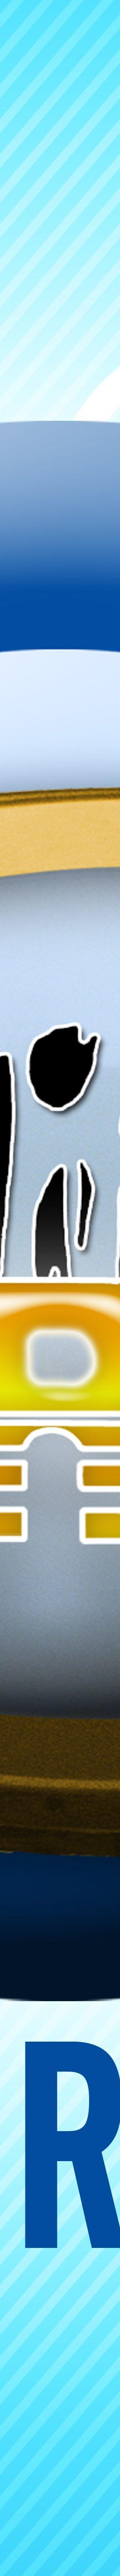 BANNER CLIP RIT_(2.00 X 3.00)